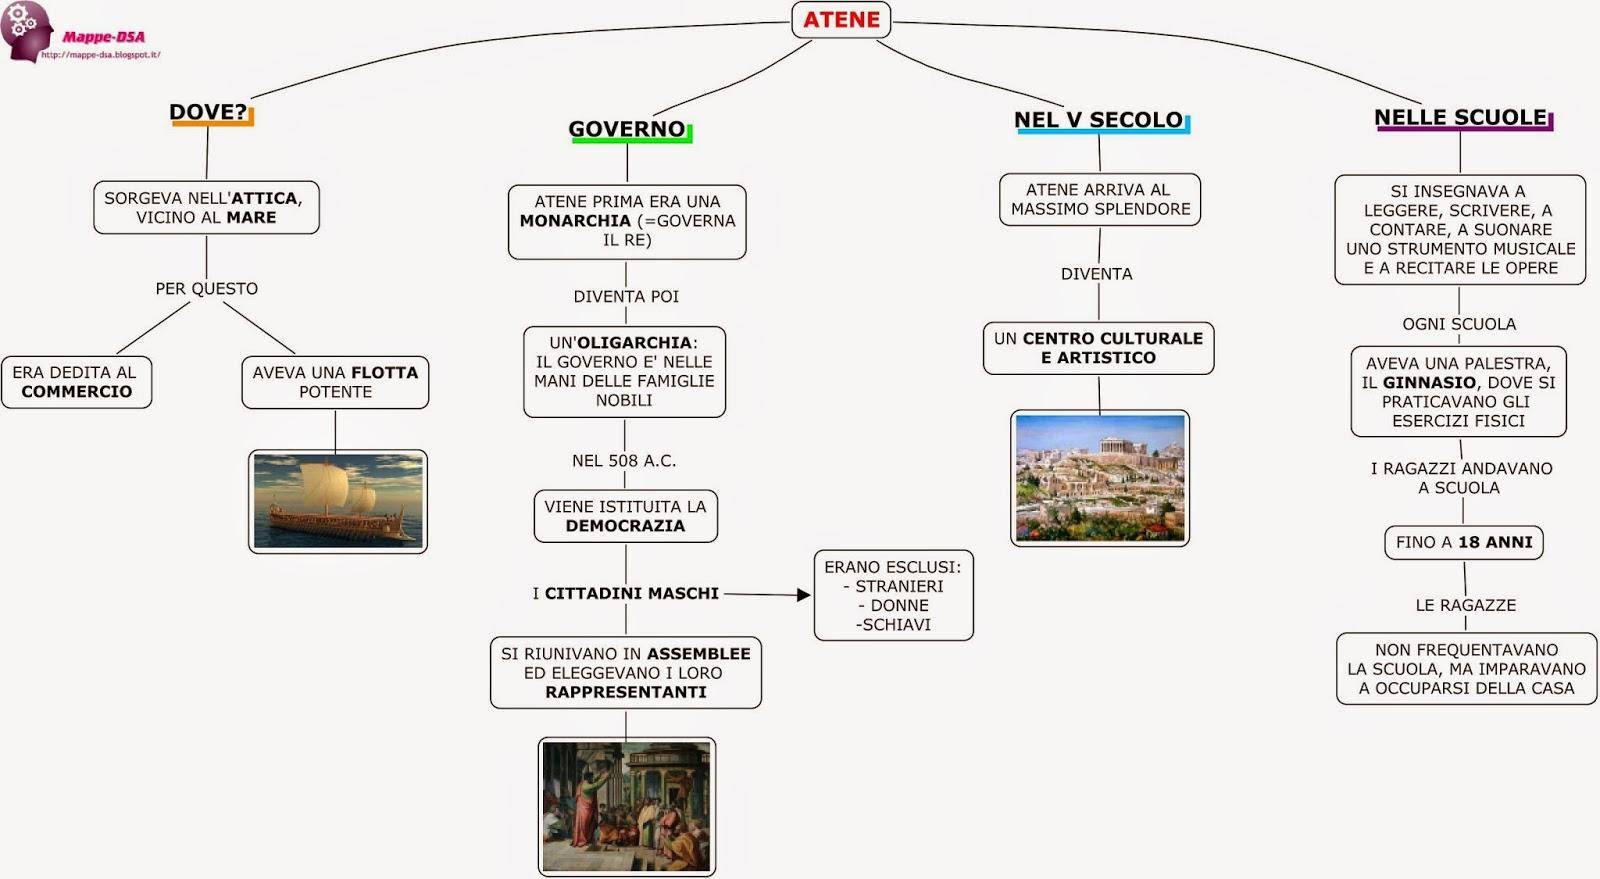 mappa schema dsa storia elementari polis Atene greci